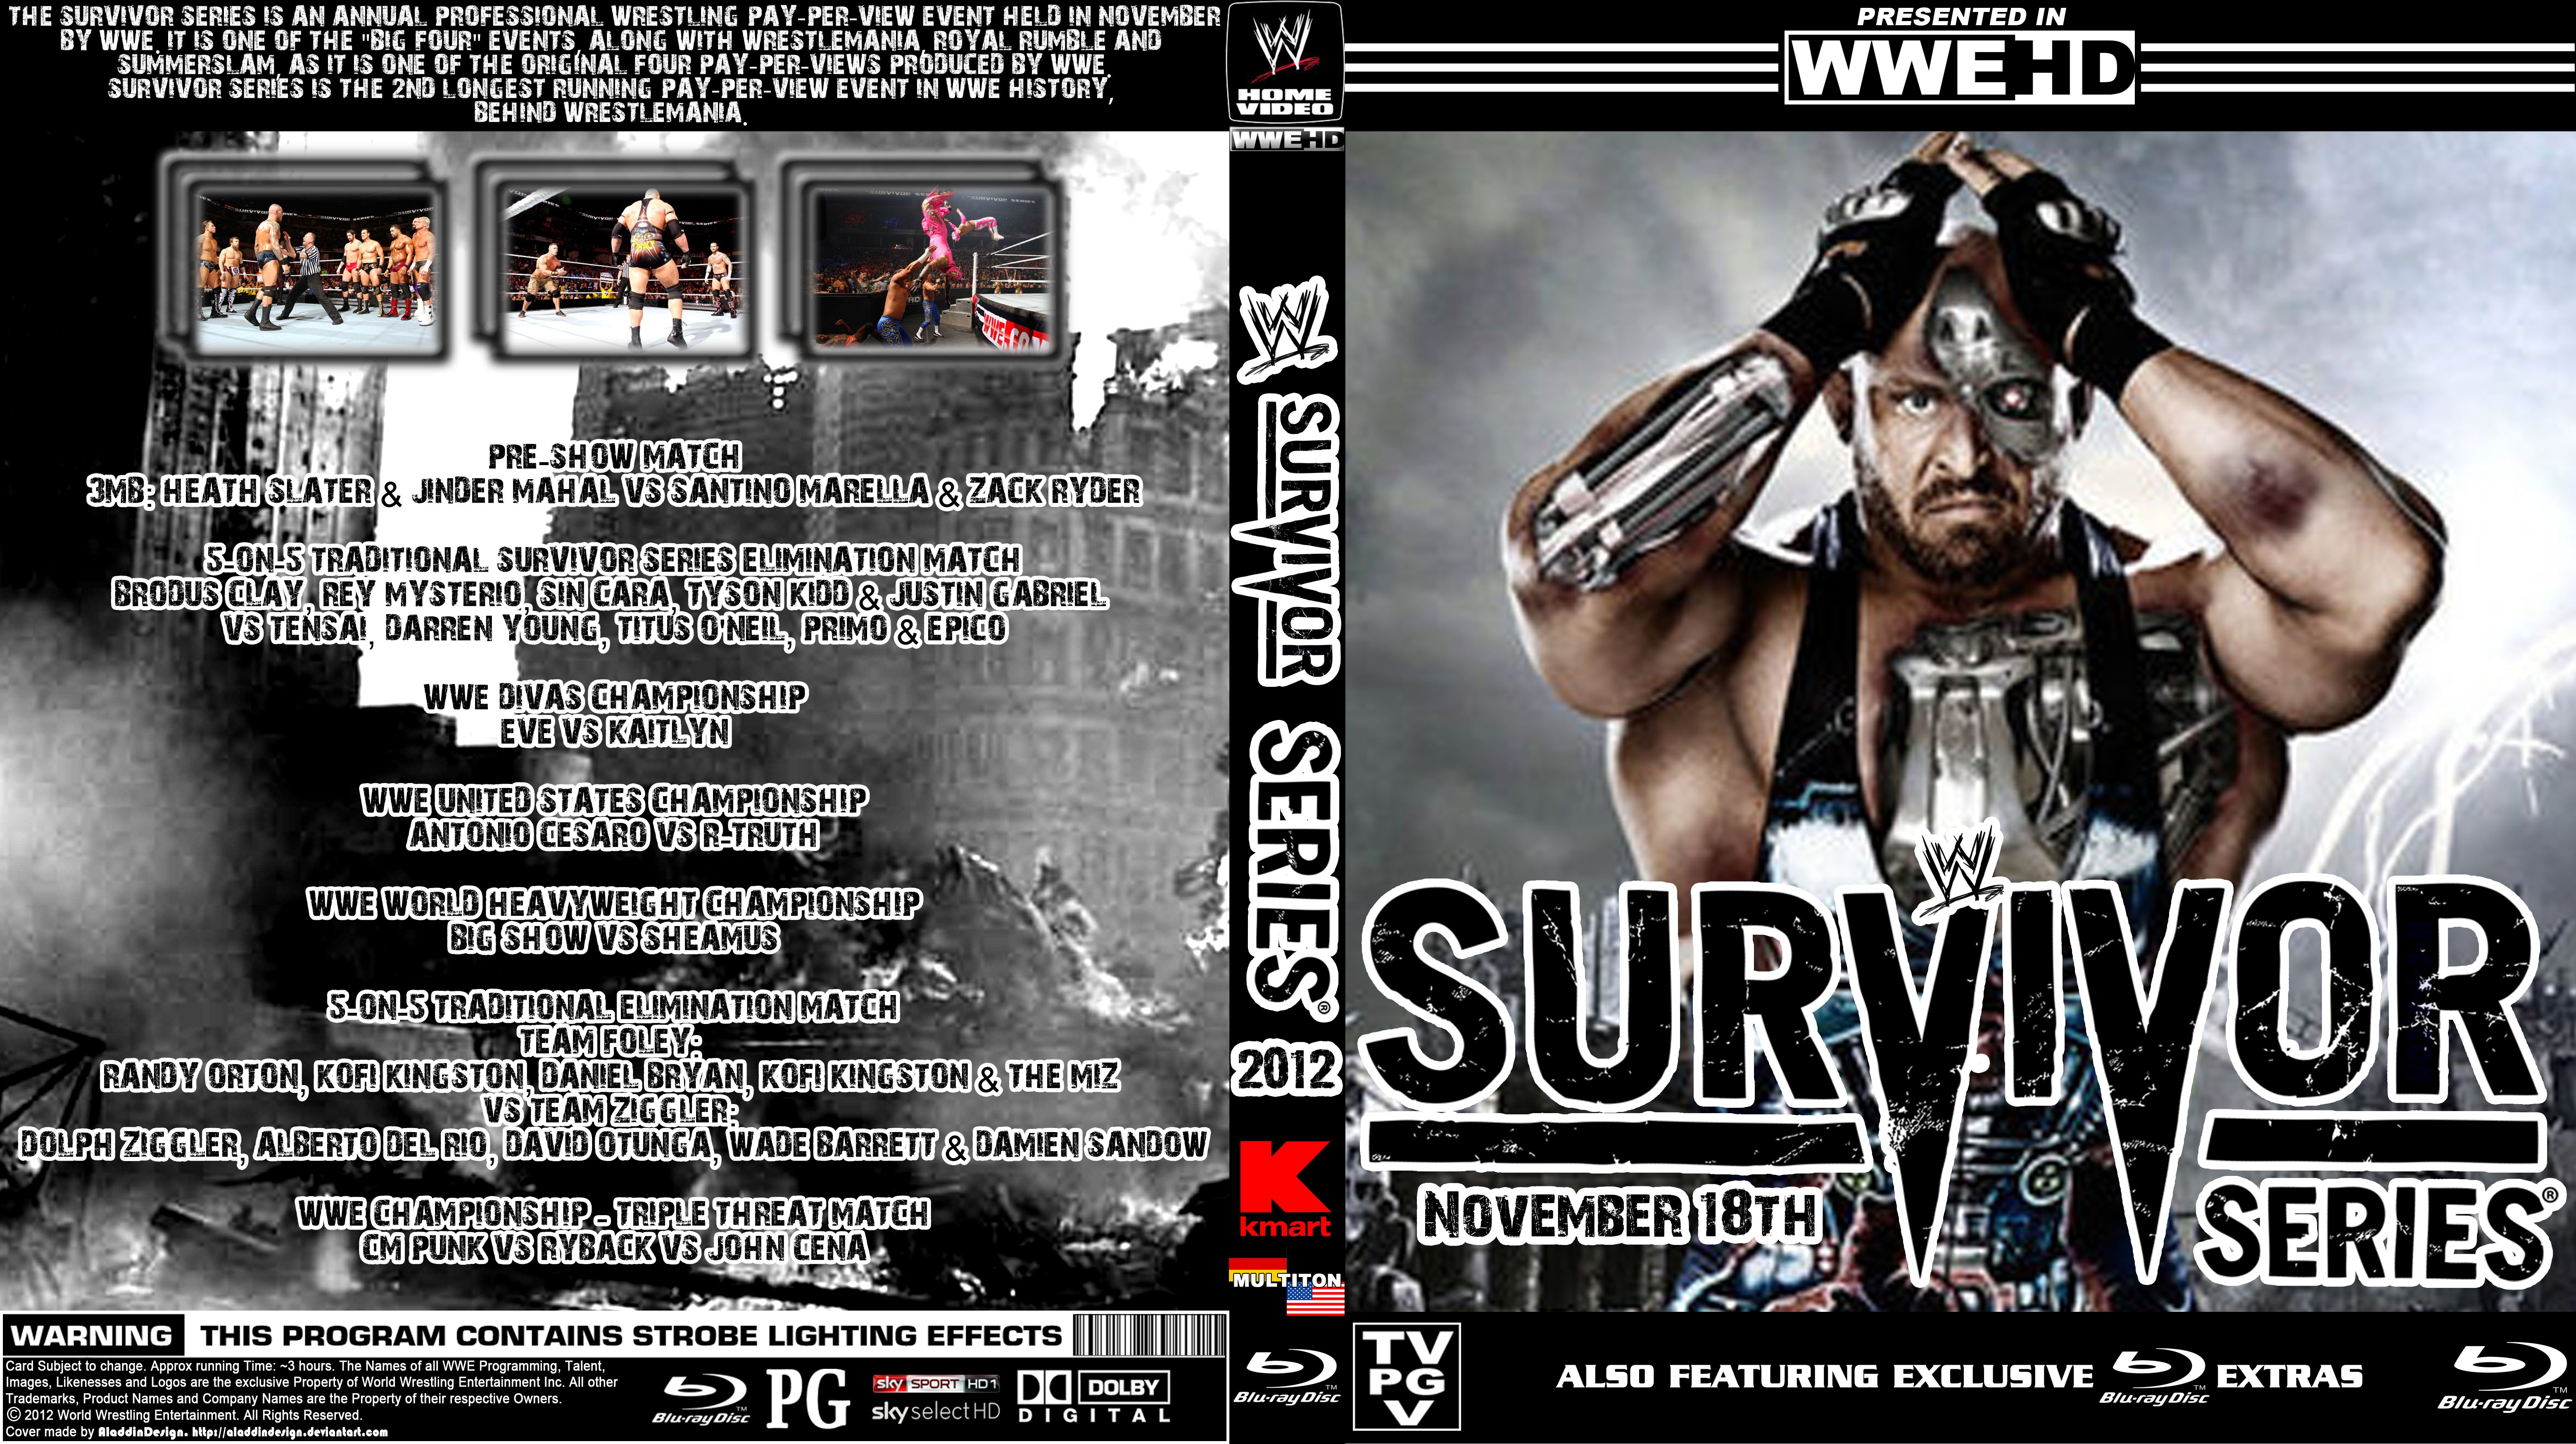 High Resolution Wallpaper   WWE Survivor Series 2012 6236x3496 px